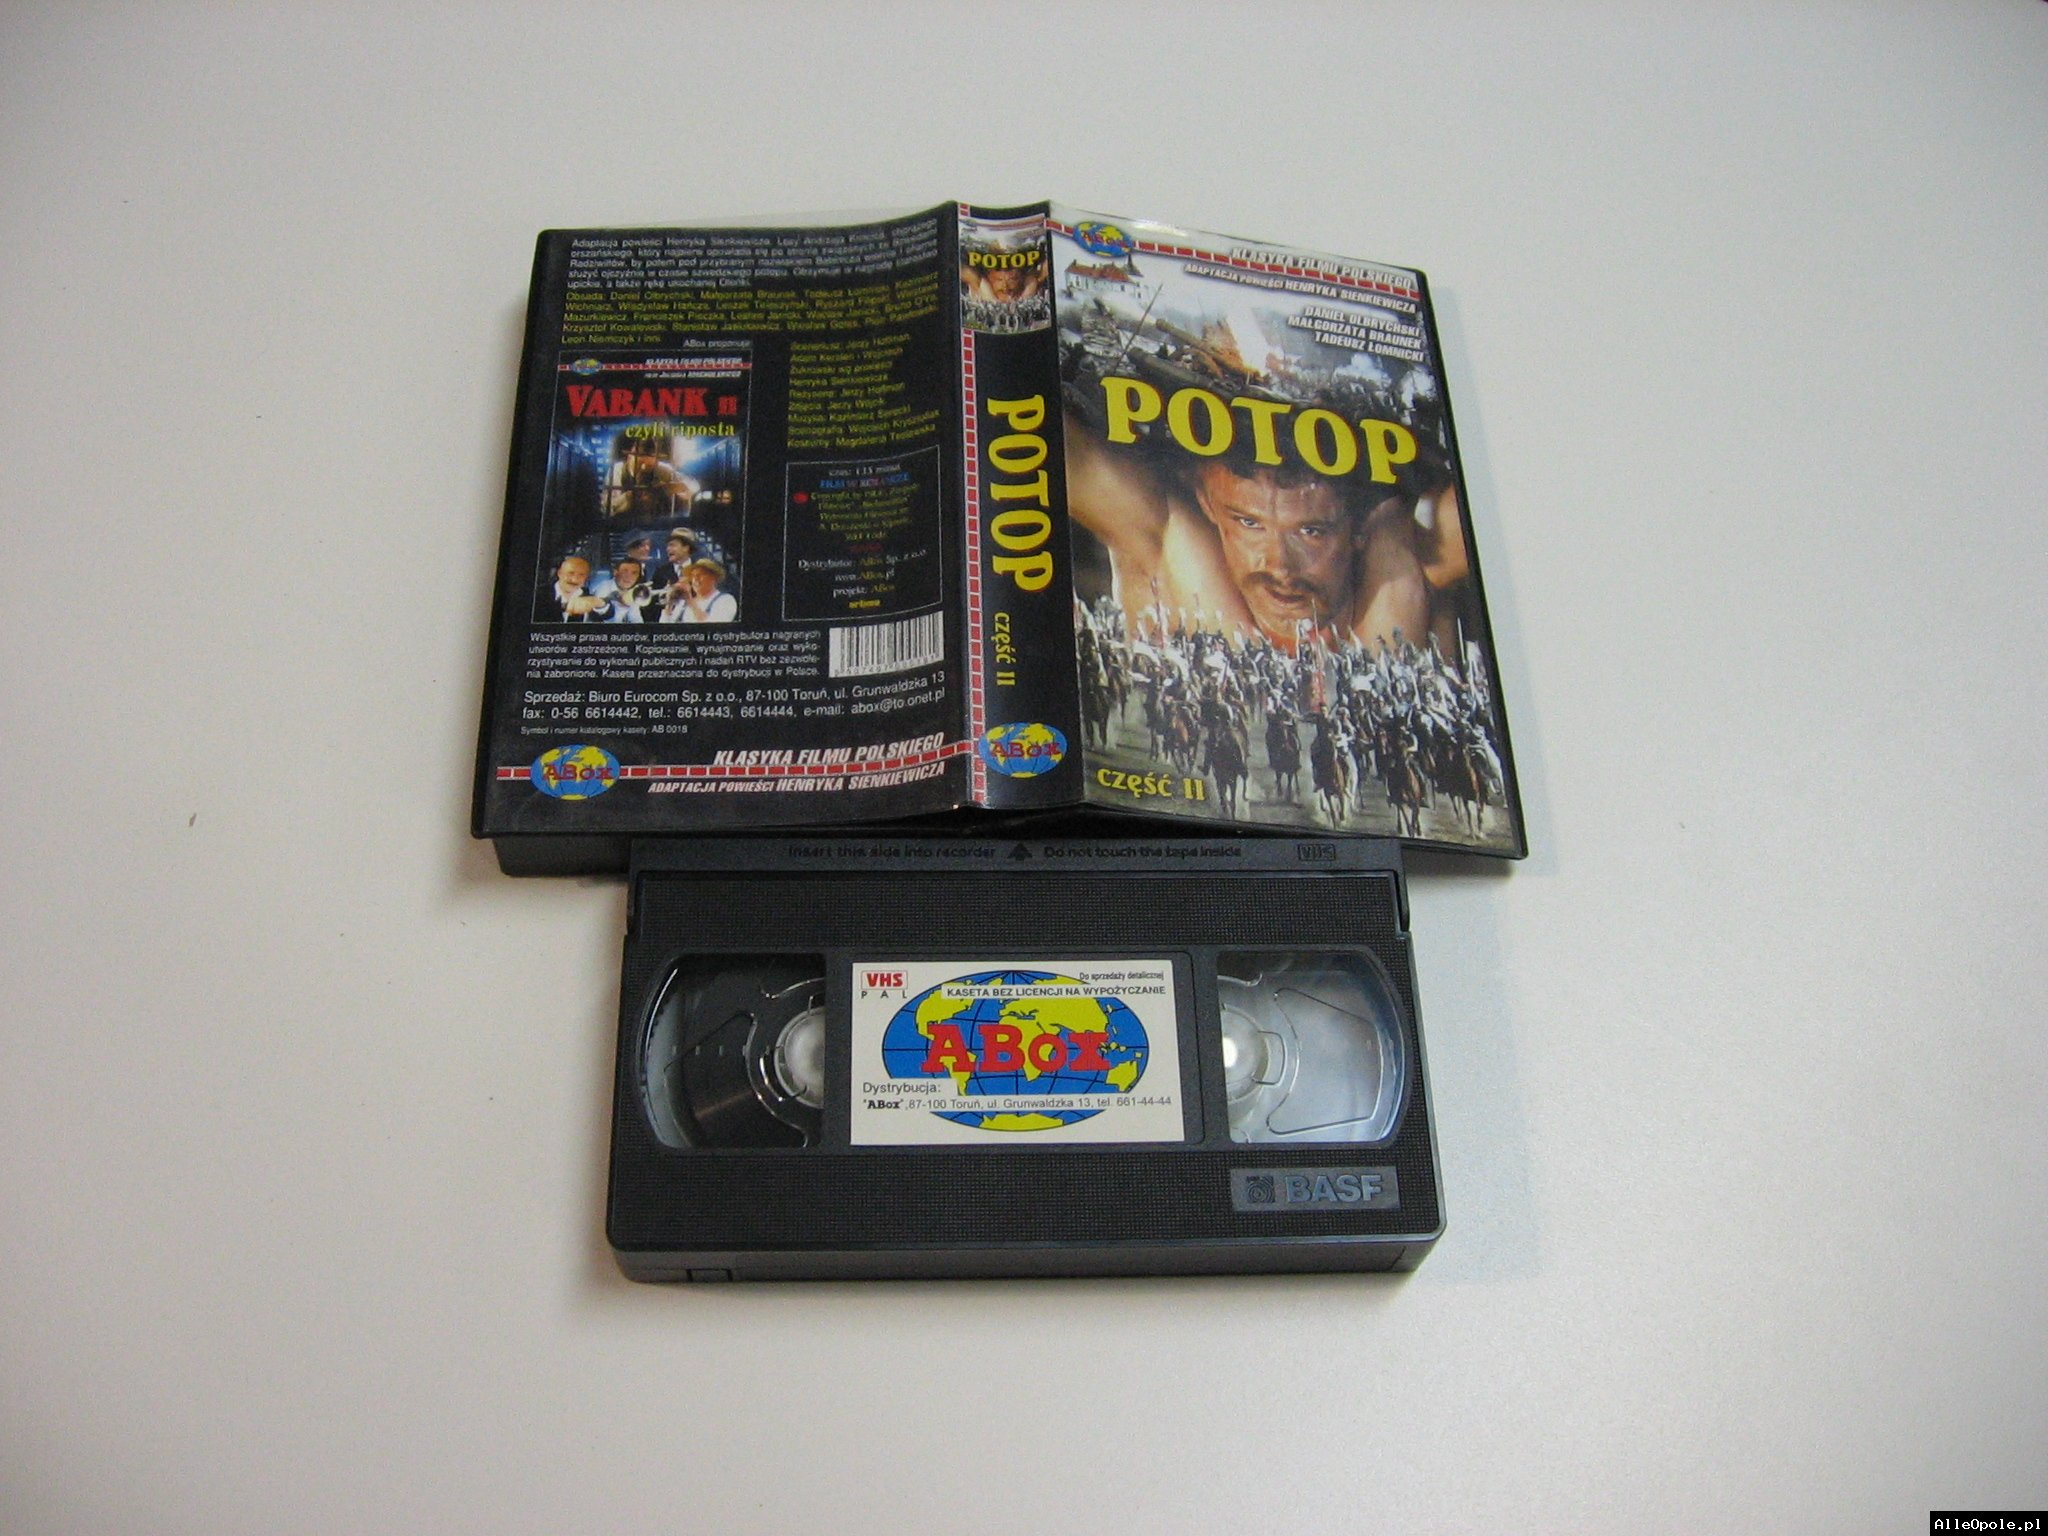 POTOP 2 - VHS Kaseta Video - Opole 1806